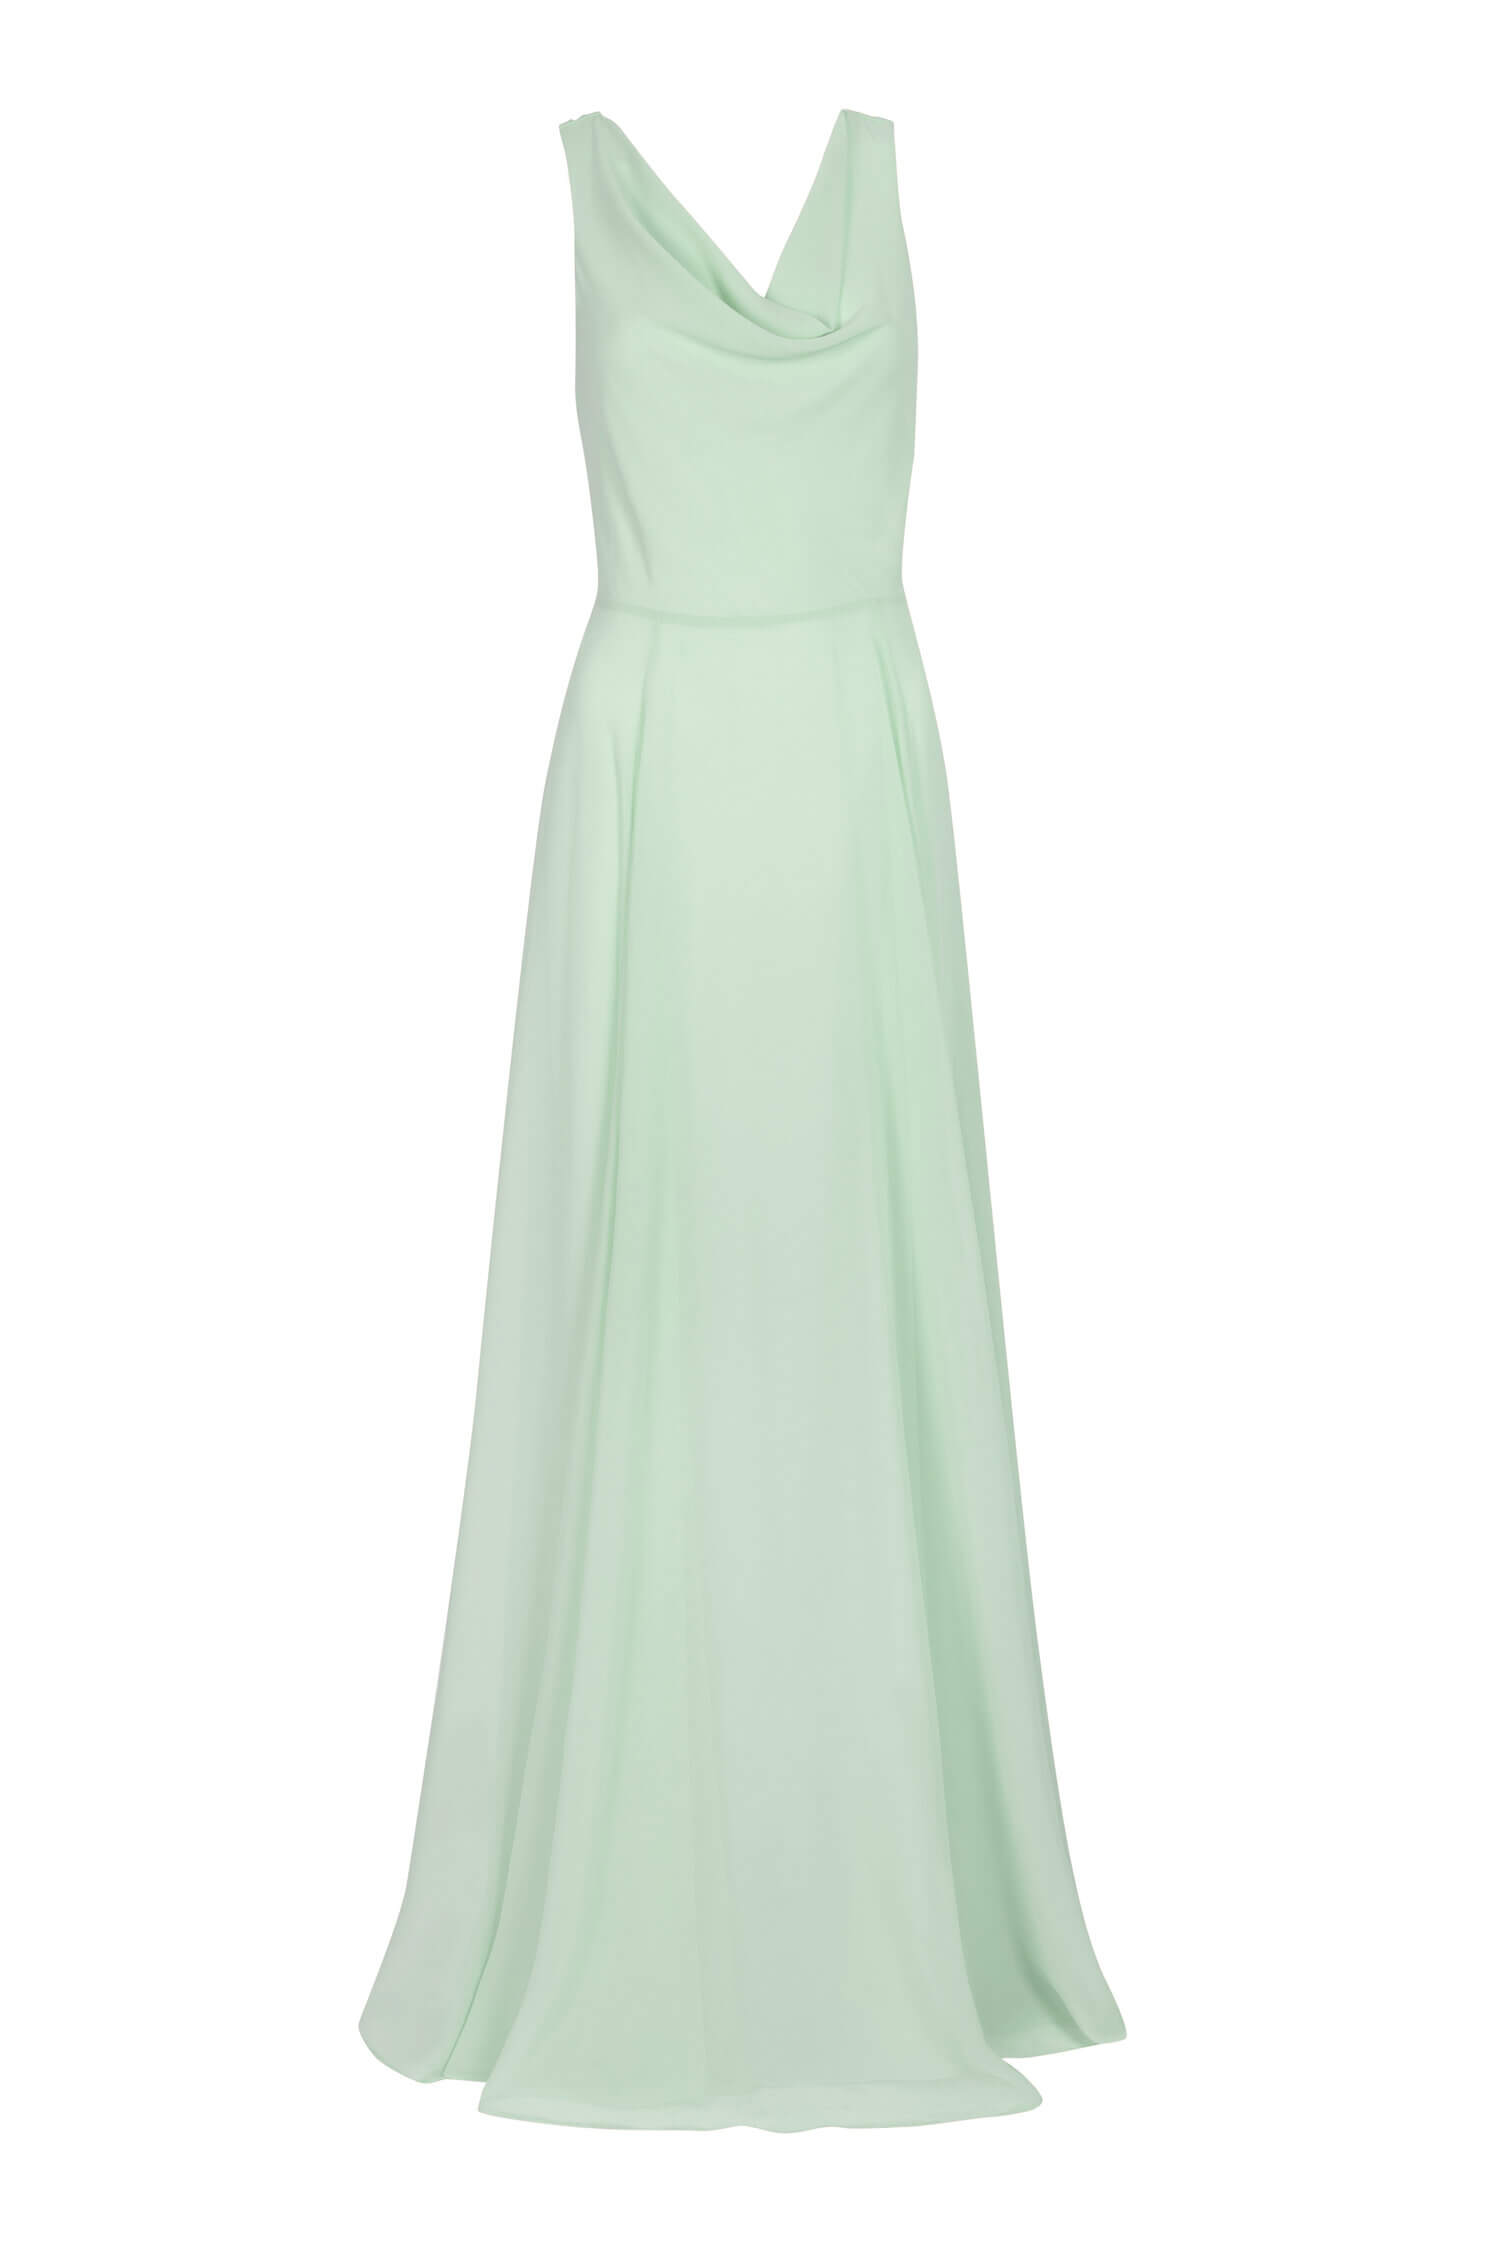 TH&H Athena Bridesmaid Dress TH&H Bridesmaid Dress Pistachio